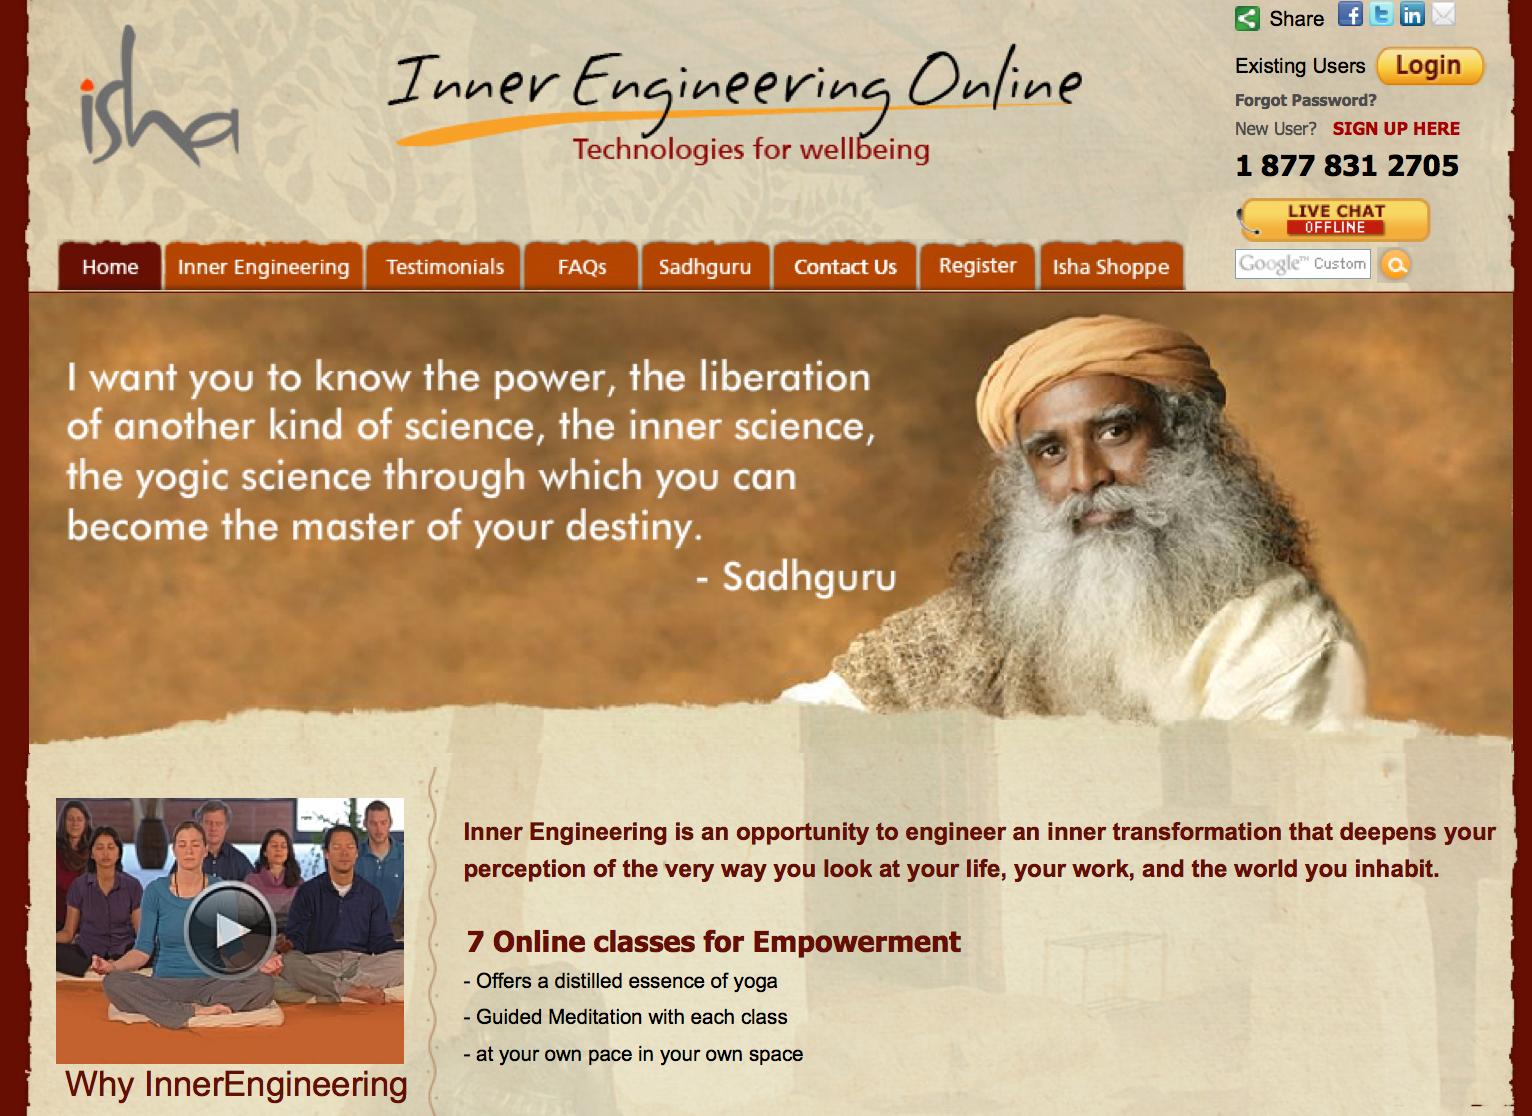 Image of original website